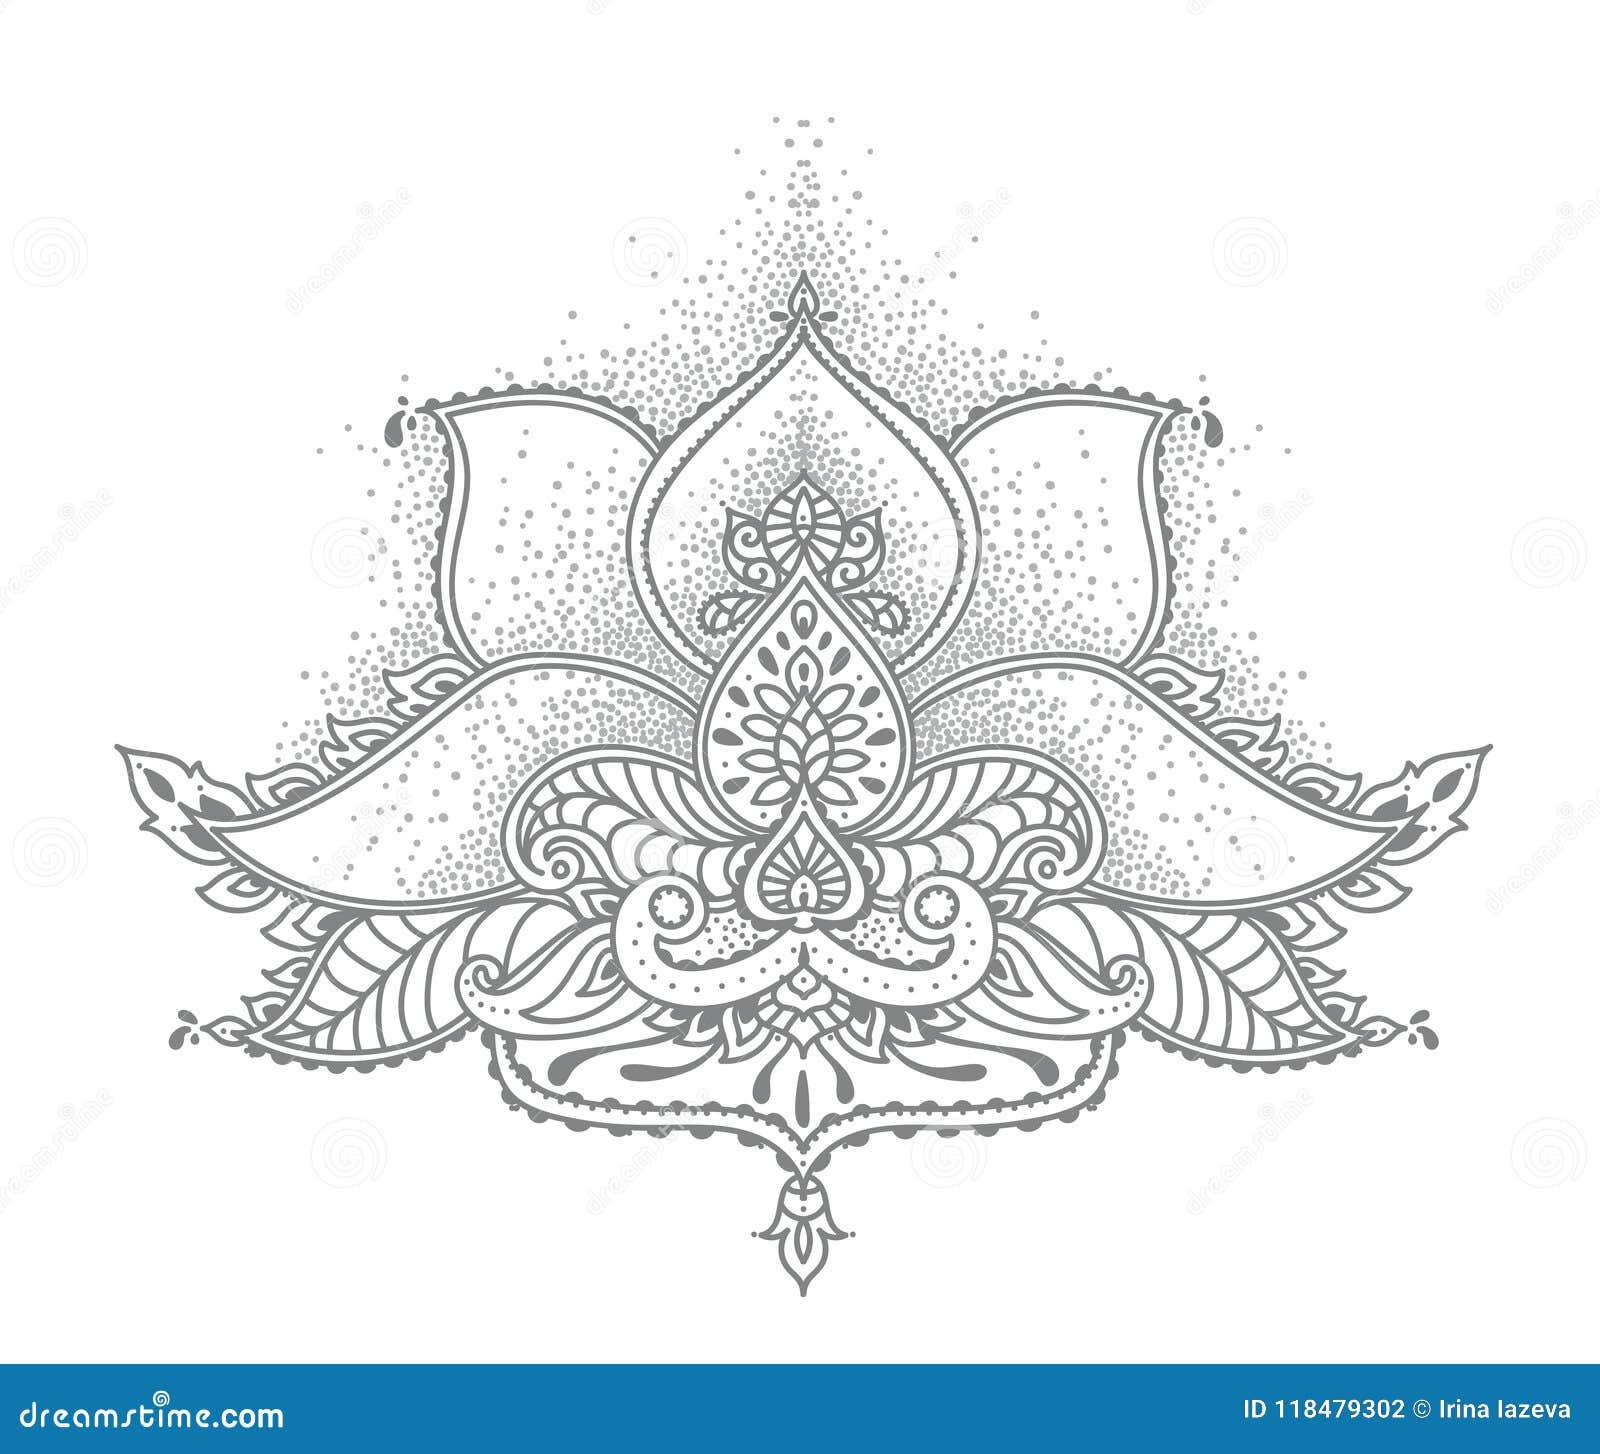 Stylized lotus flower in indian mehndi style stock vector download stylized lotus flower in indian mehndi style stock vector illustration of meditation asian mightylinksfo